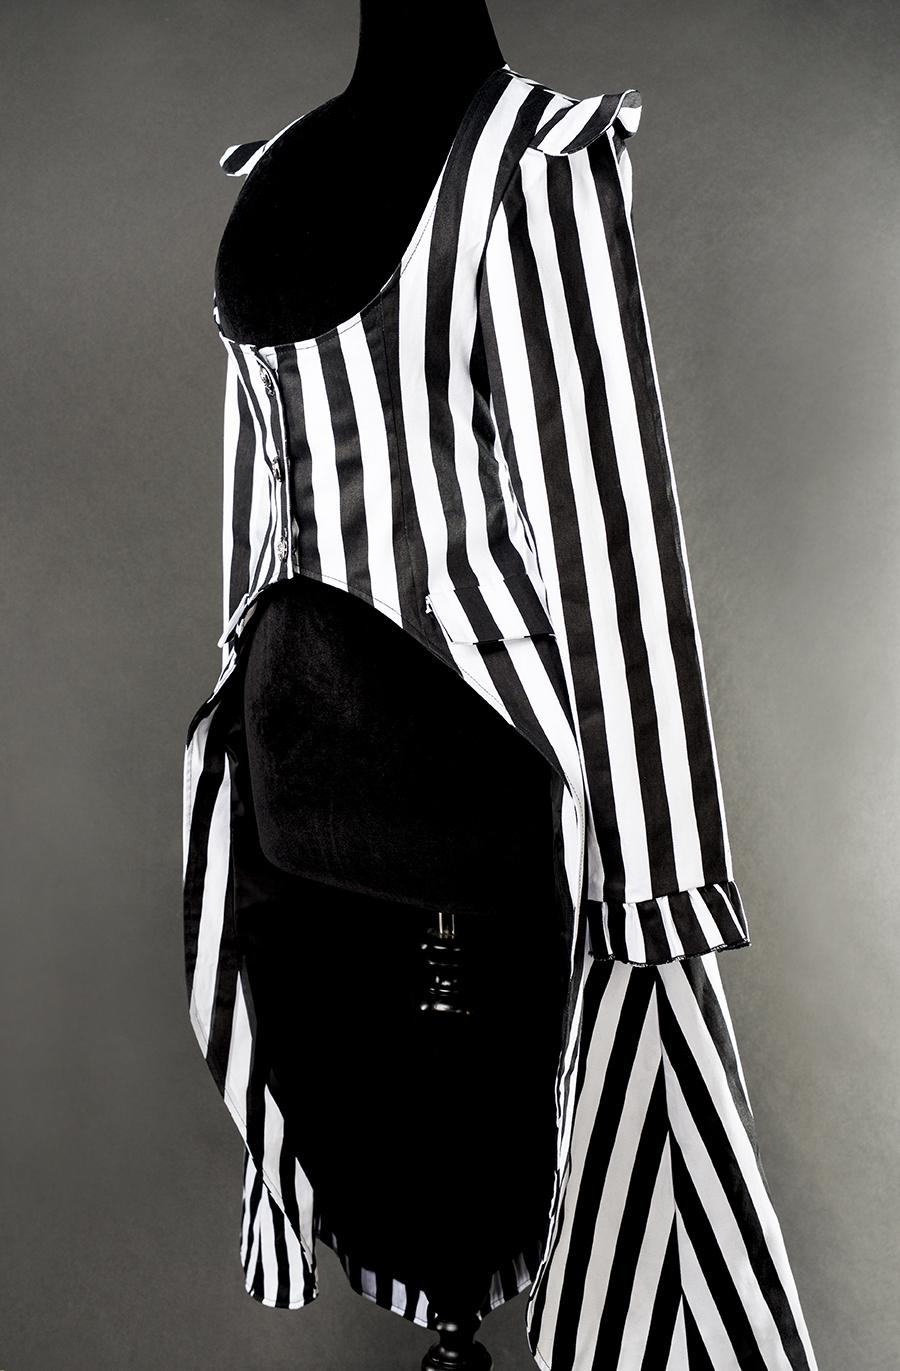 rebelsmarket_ladies_black_white_striped_victorian_gothic_tail_coat_jacket_9_to_ship_jackets_5.jpg